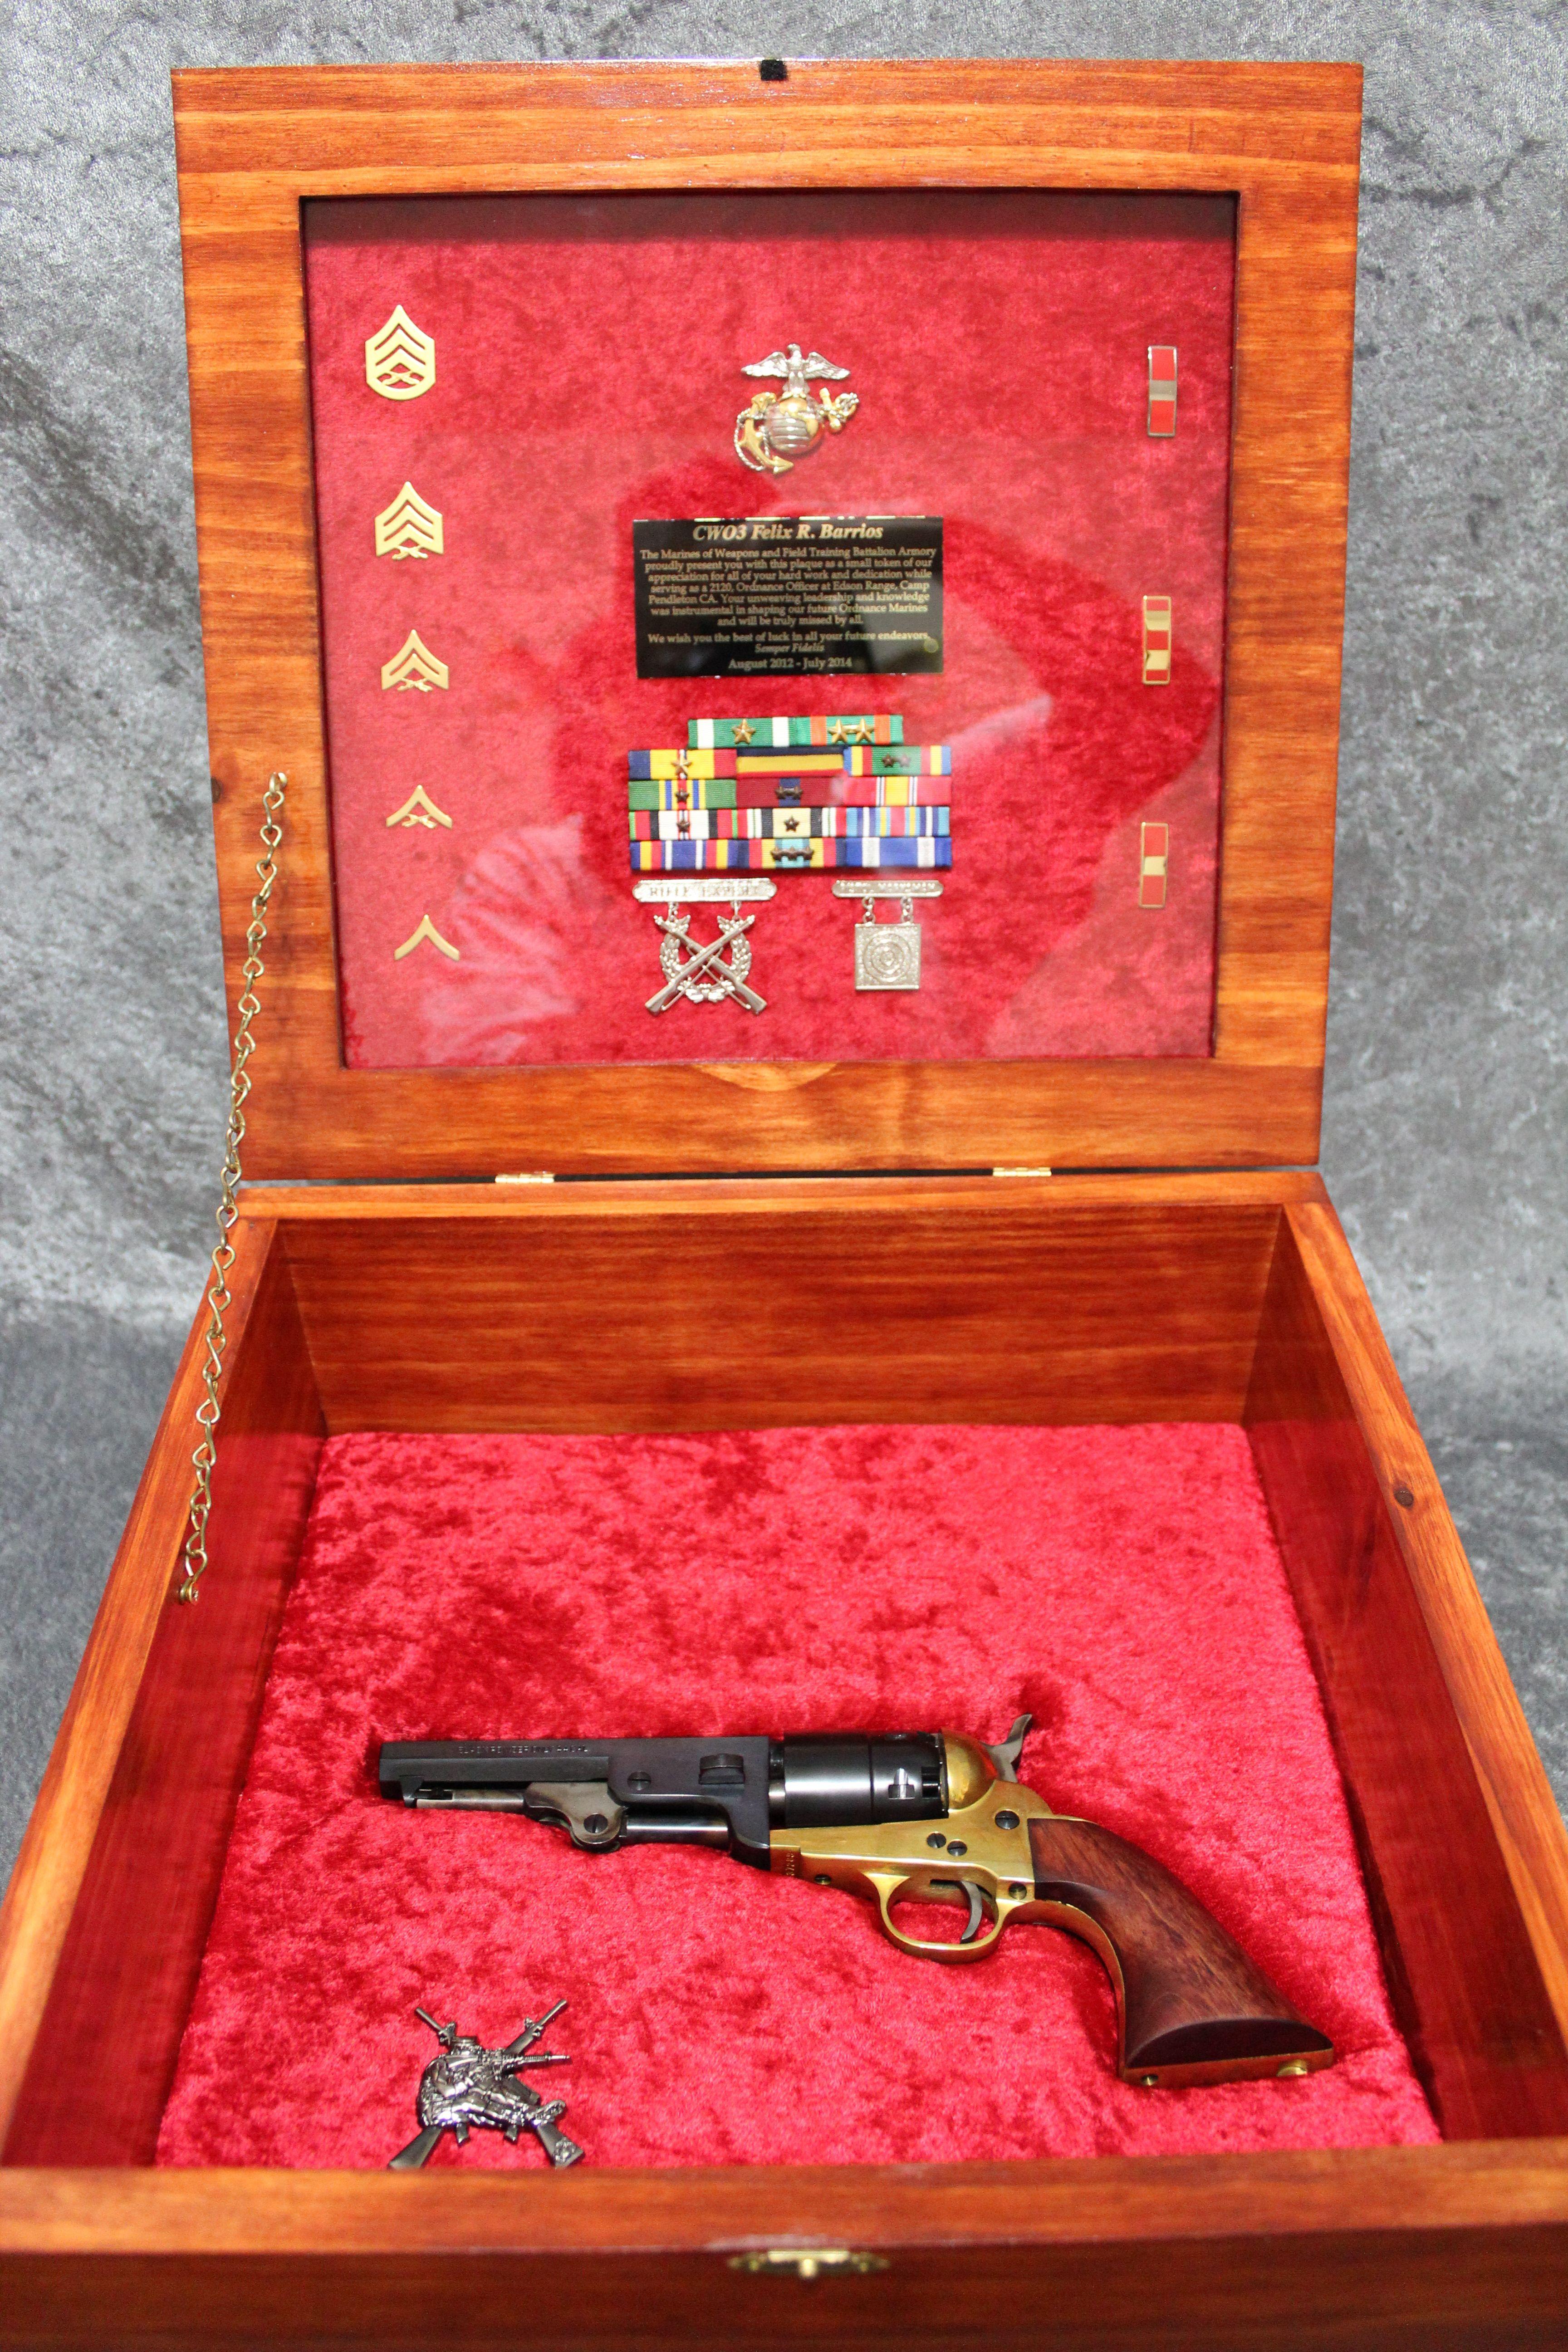 Double pistol handgun revolver gun display case cabinet rack shadowbox - Usmc Plaque Questions On Design Or Price Contact Lunawood1775 Gmail Com